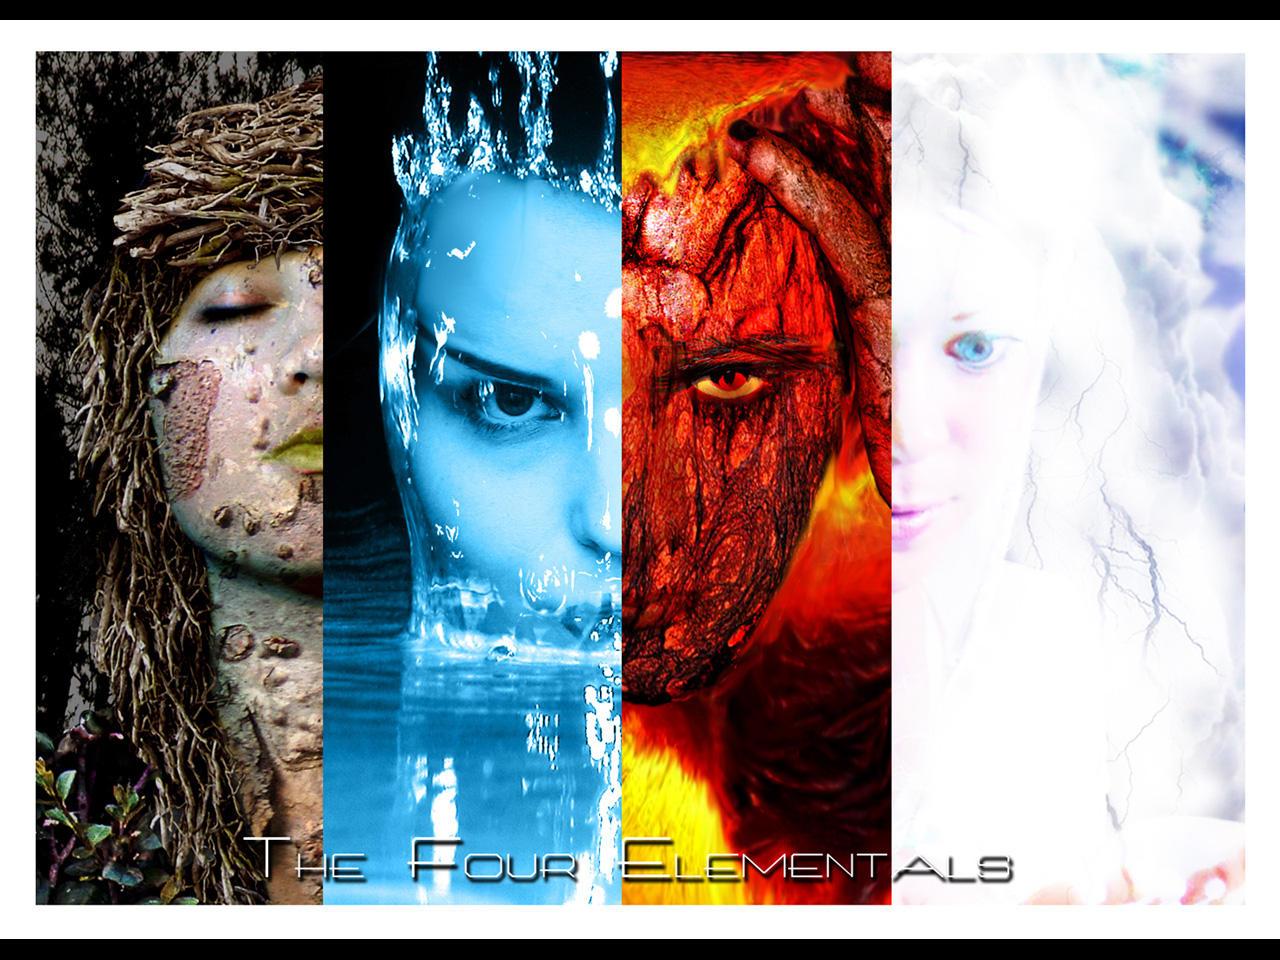 The Four Elementals by kimqueg